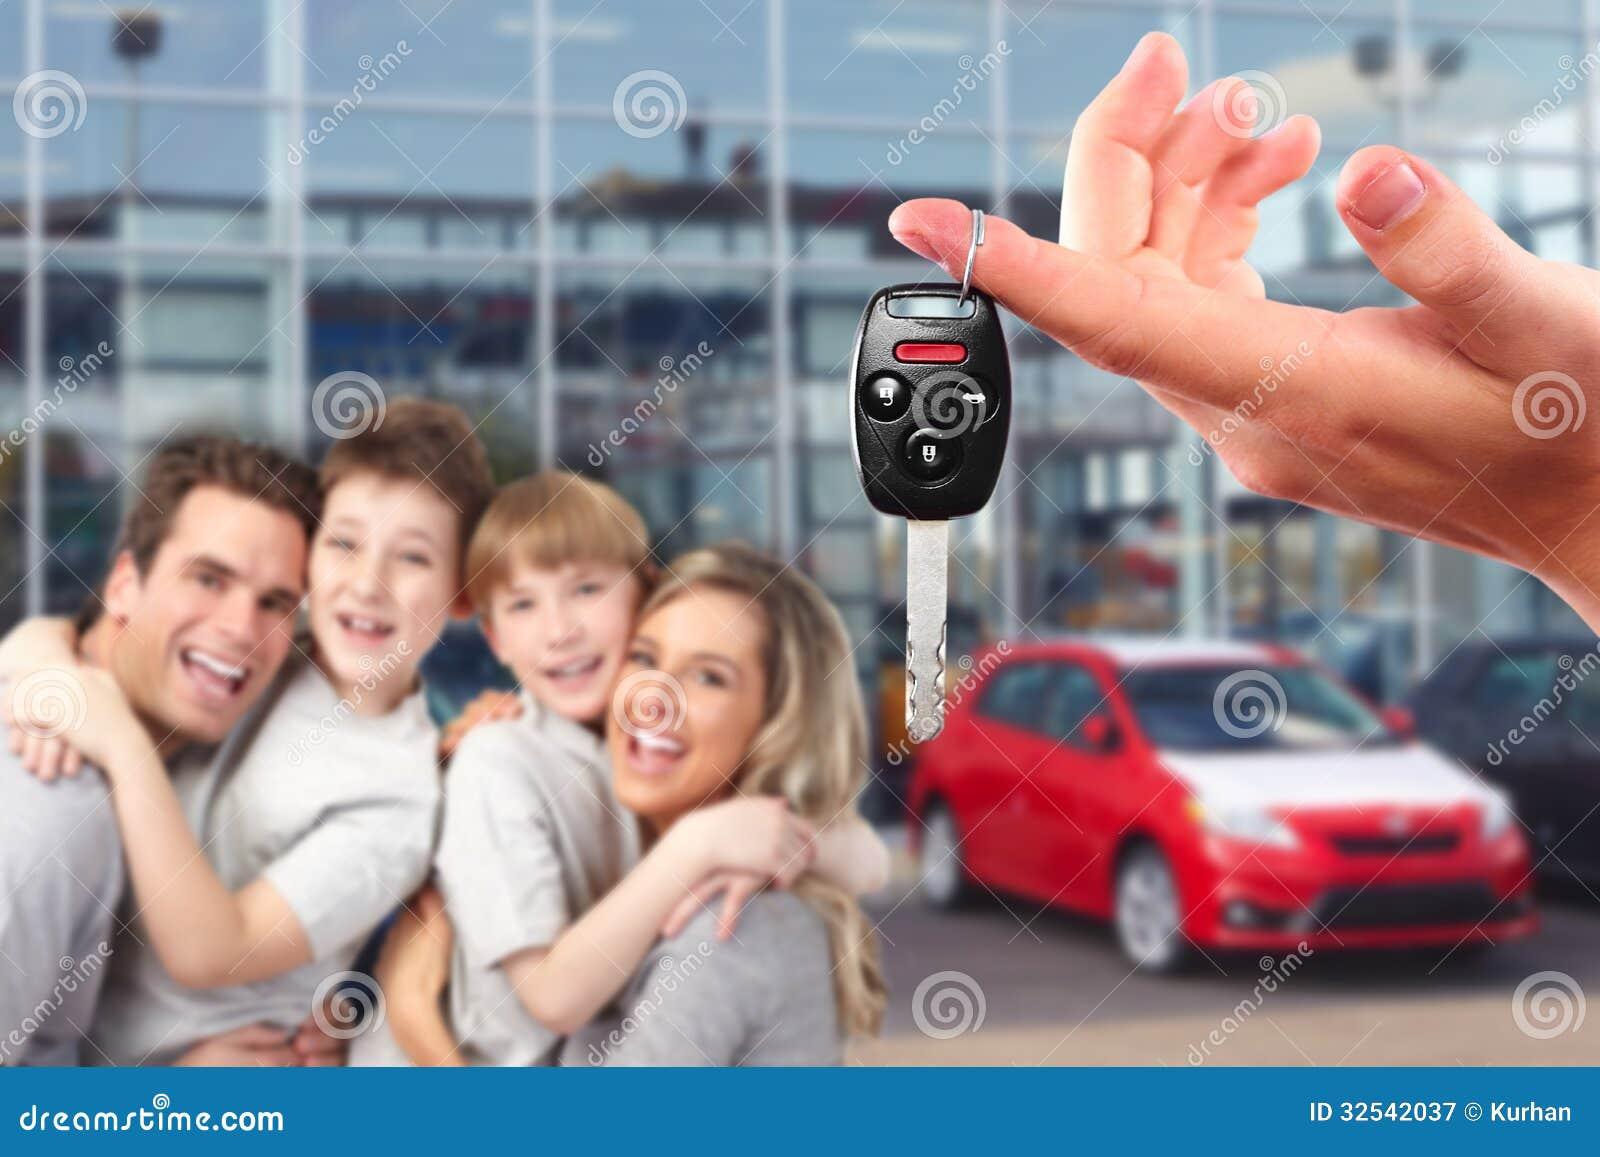 Happy family with a new car keys.